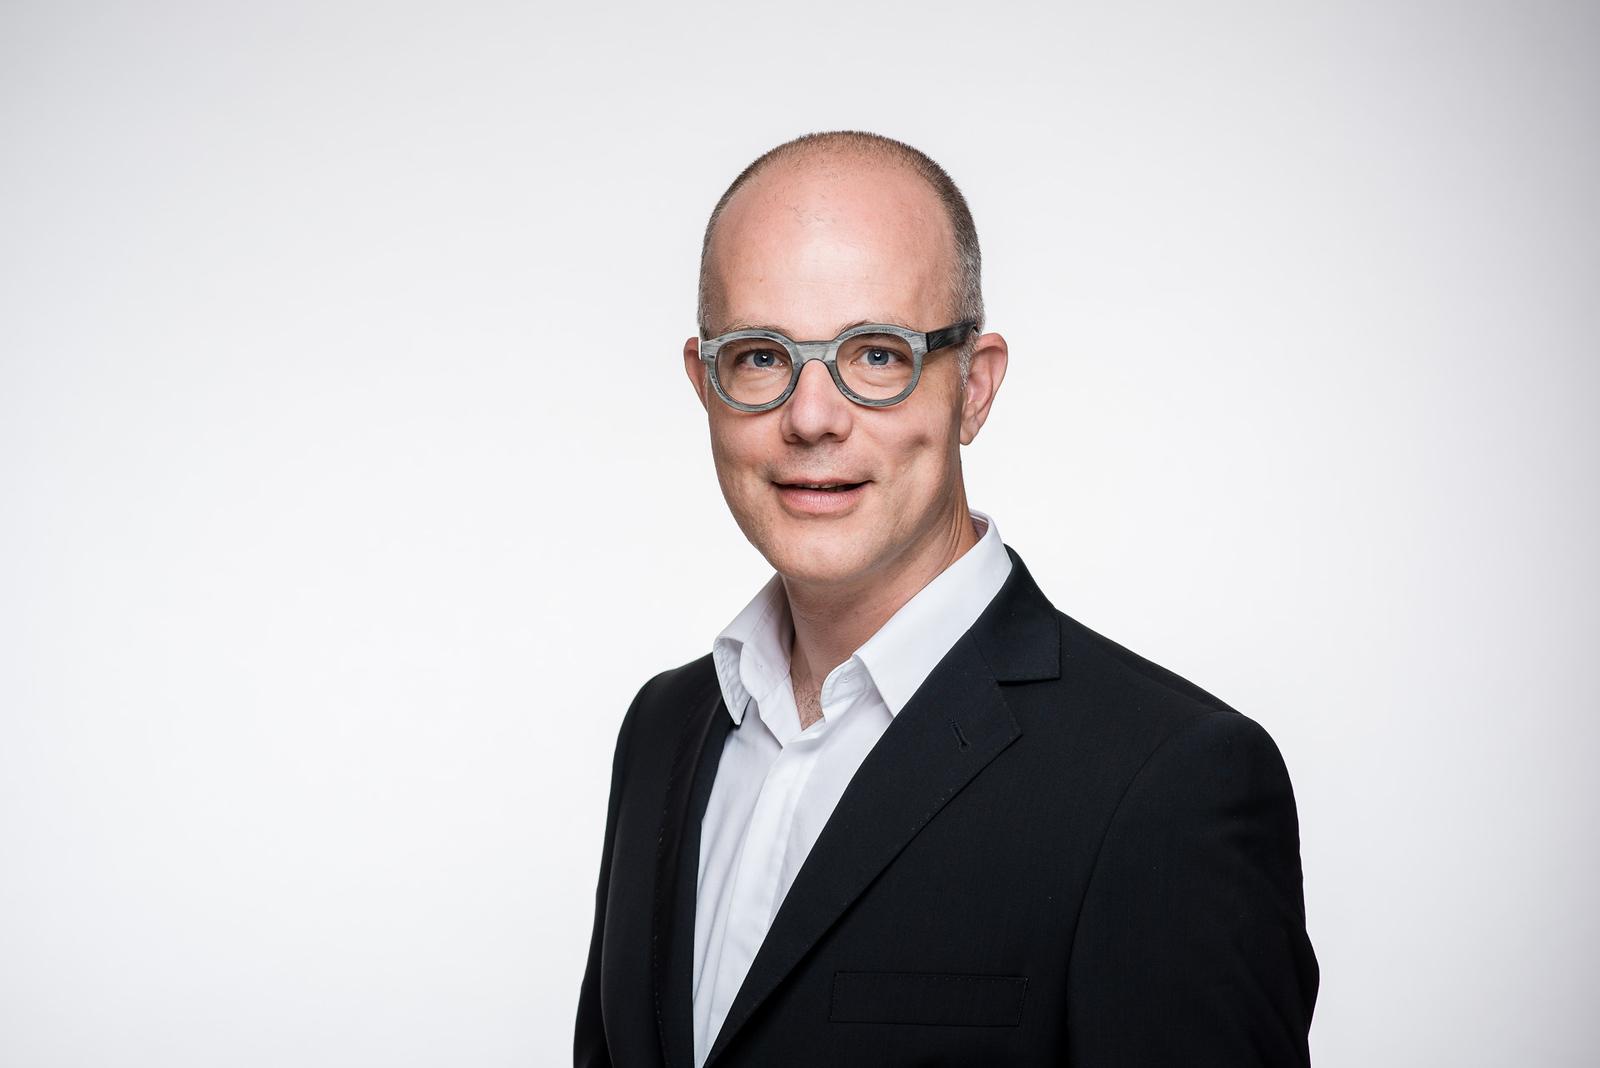 Christoph-Slupetzky-6